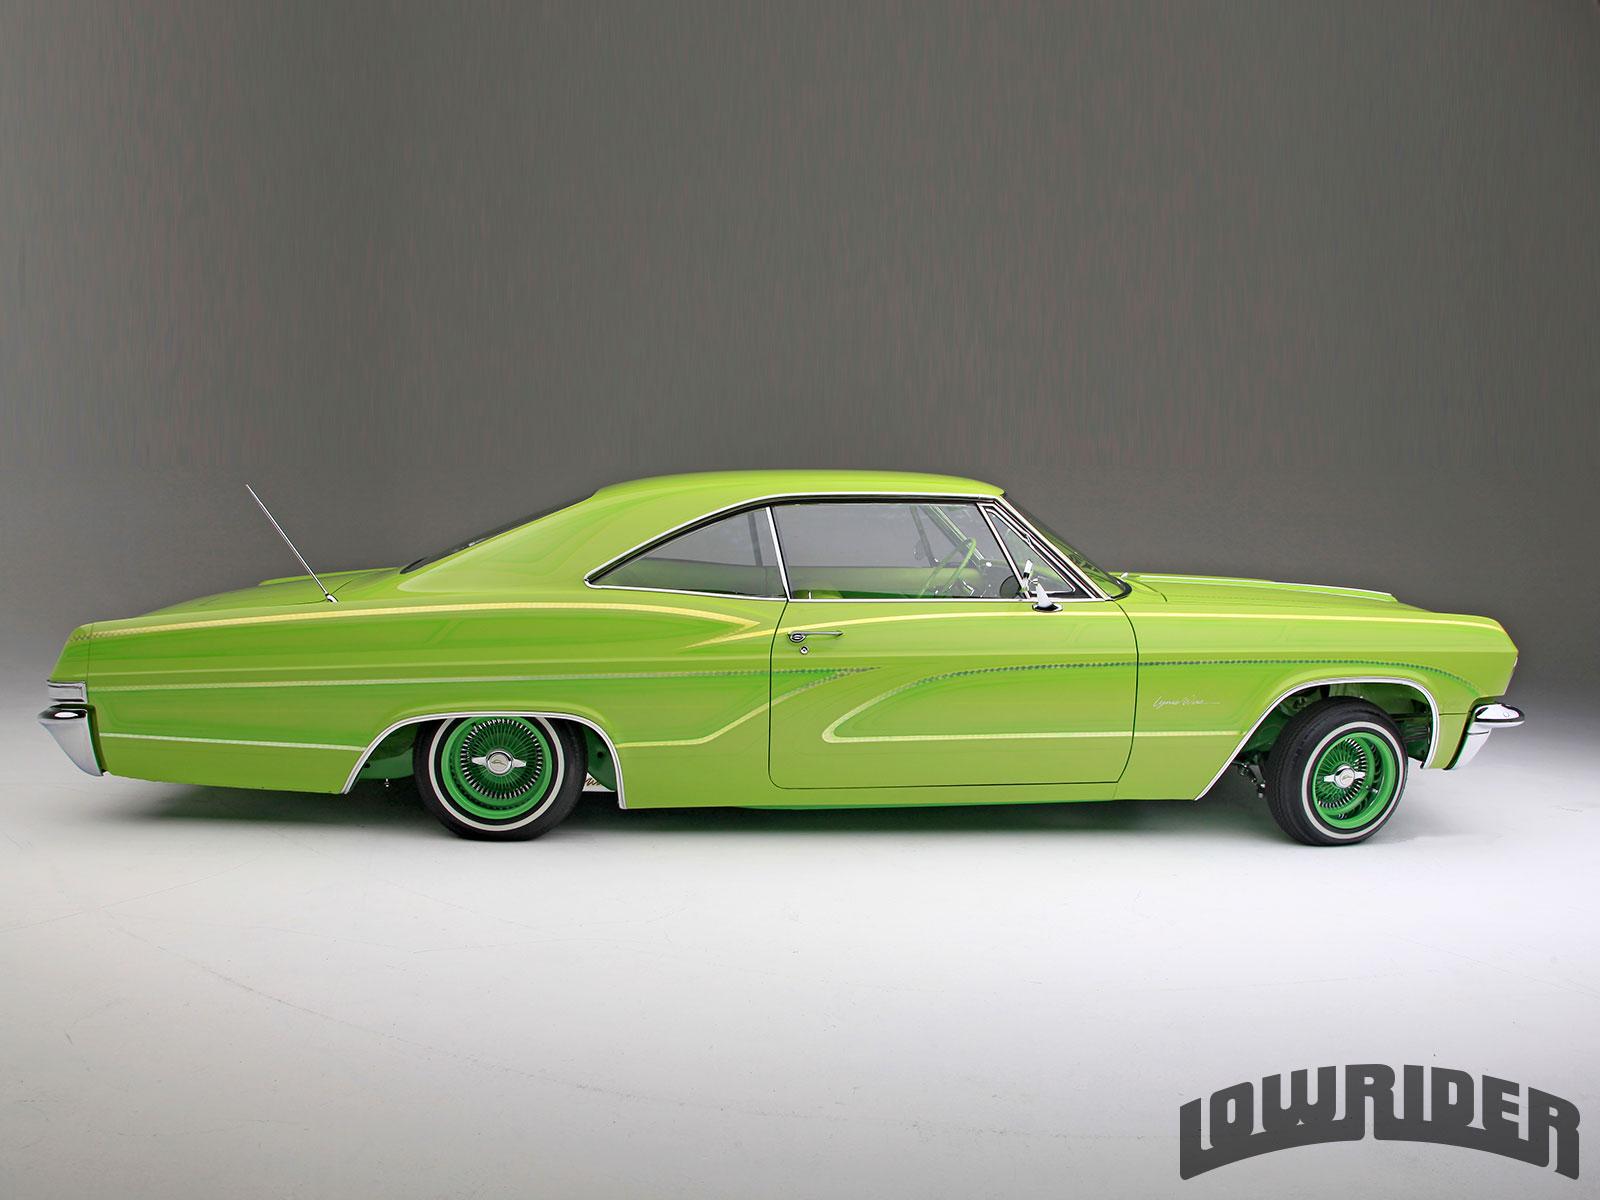 1965 Chevrolet Impala Lowrider Magazine